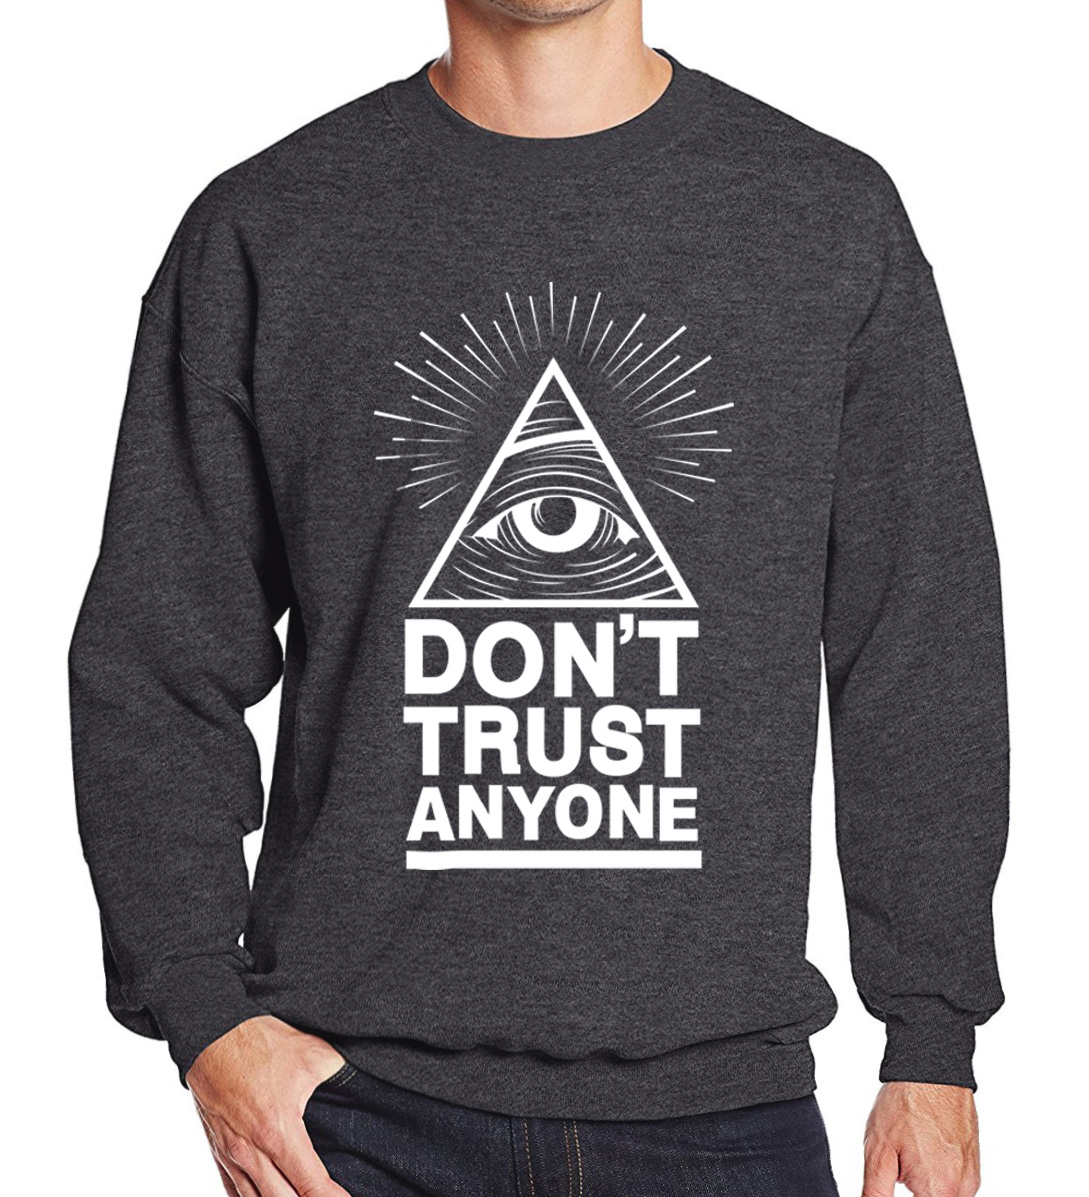 2017 hoodies männer sweatshirt frühling winter Nicht Vertrauen Alle Illuminati All Seeing Eye gedruckt mode kühlen männer sportwear kpop